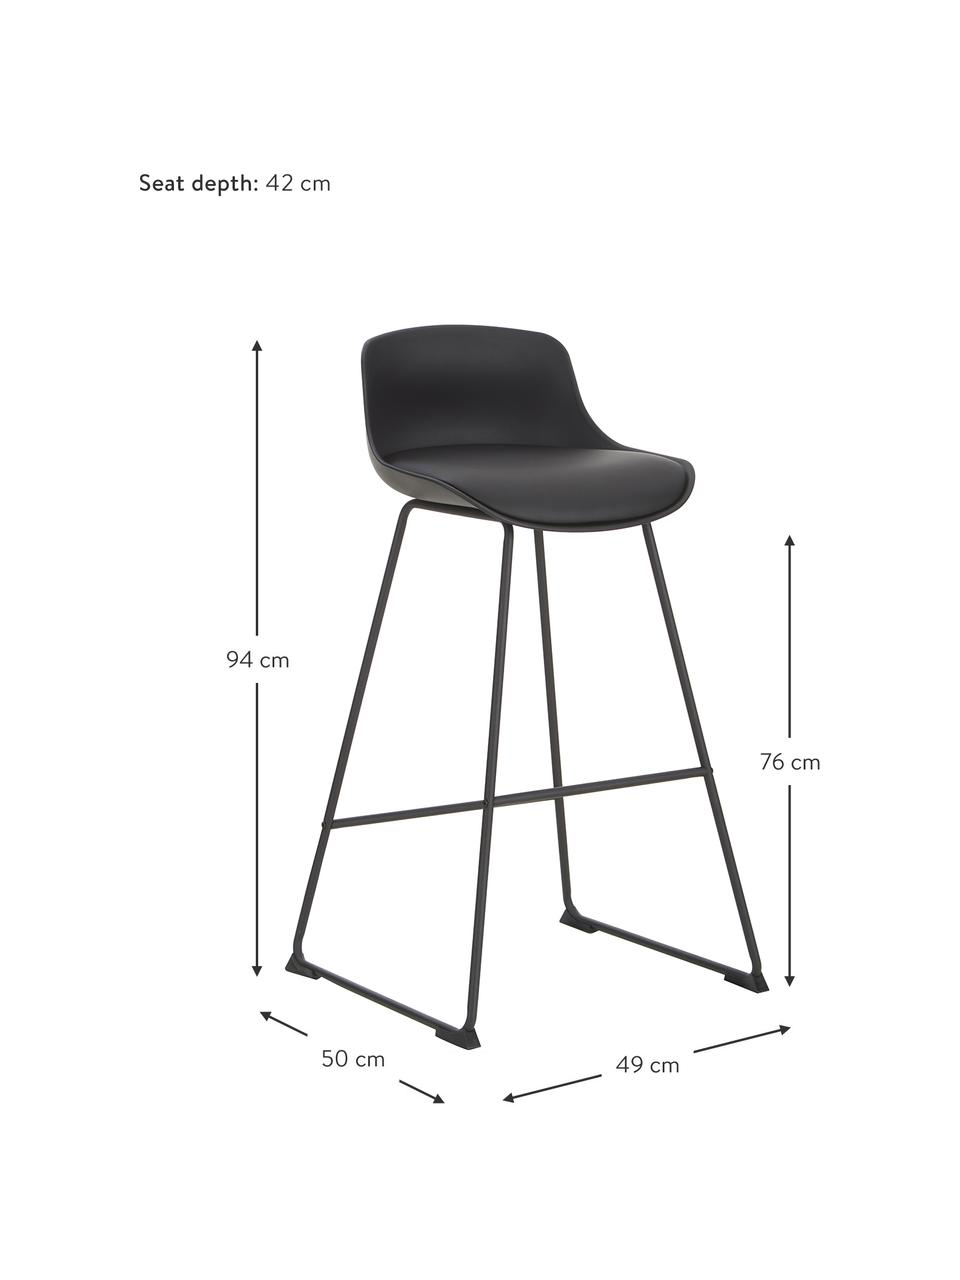 Sedia da bar in similpelle Tina 2 pz, Rivestimento: similpelle (poliuretano), Gambe: metallo verniciato a polv, Nero, Larg. 49 x Prof. 94 cm